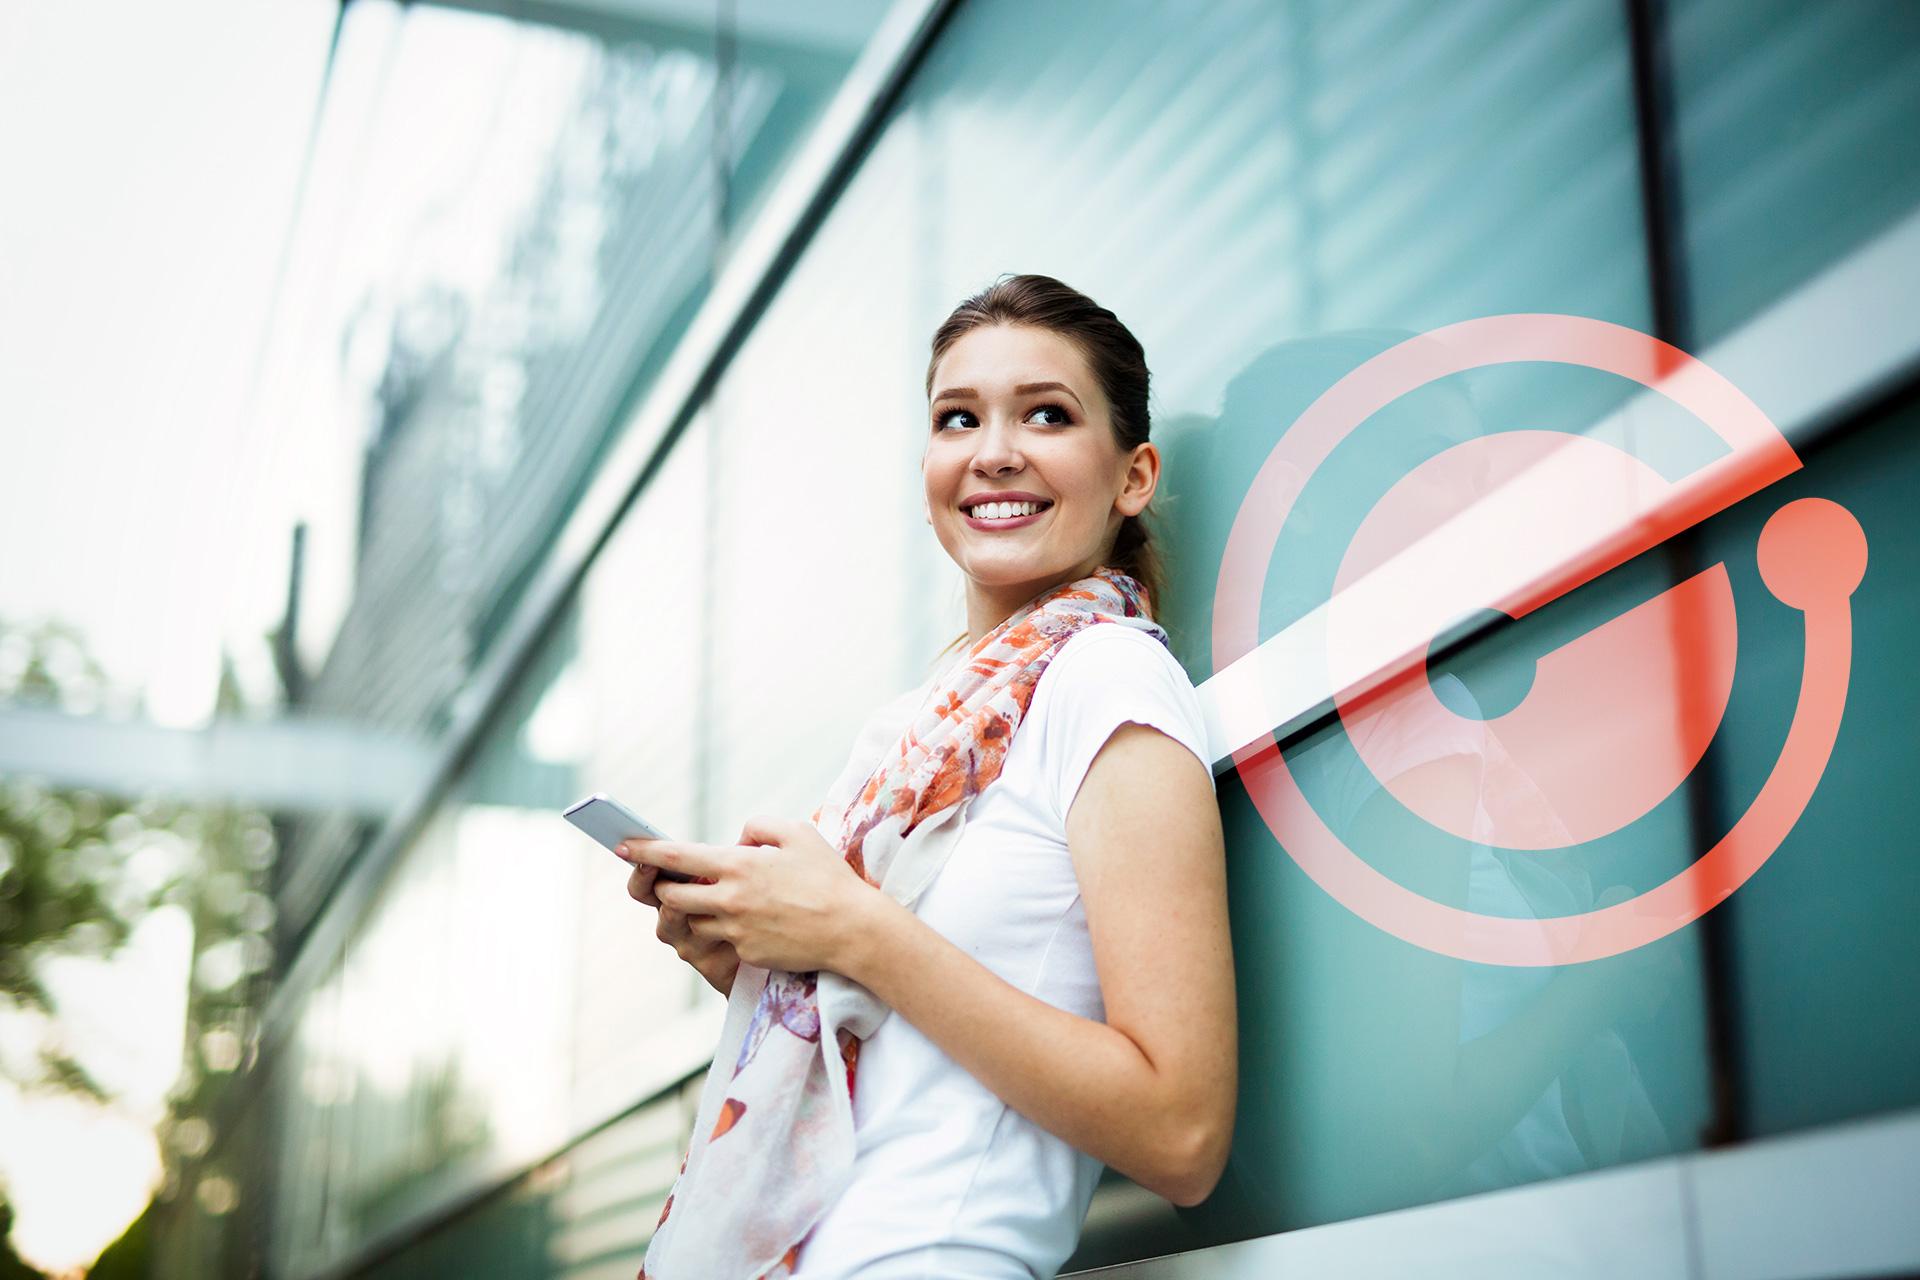 social media management services for businesses